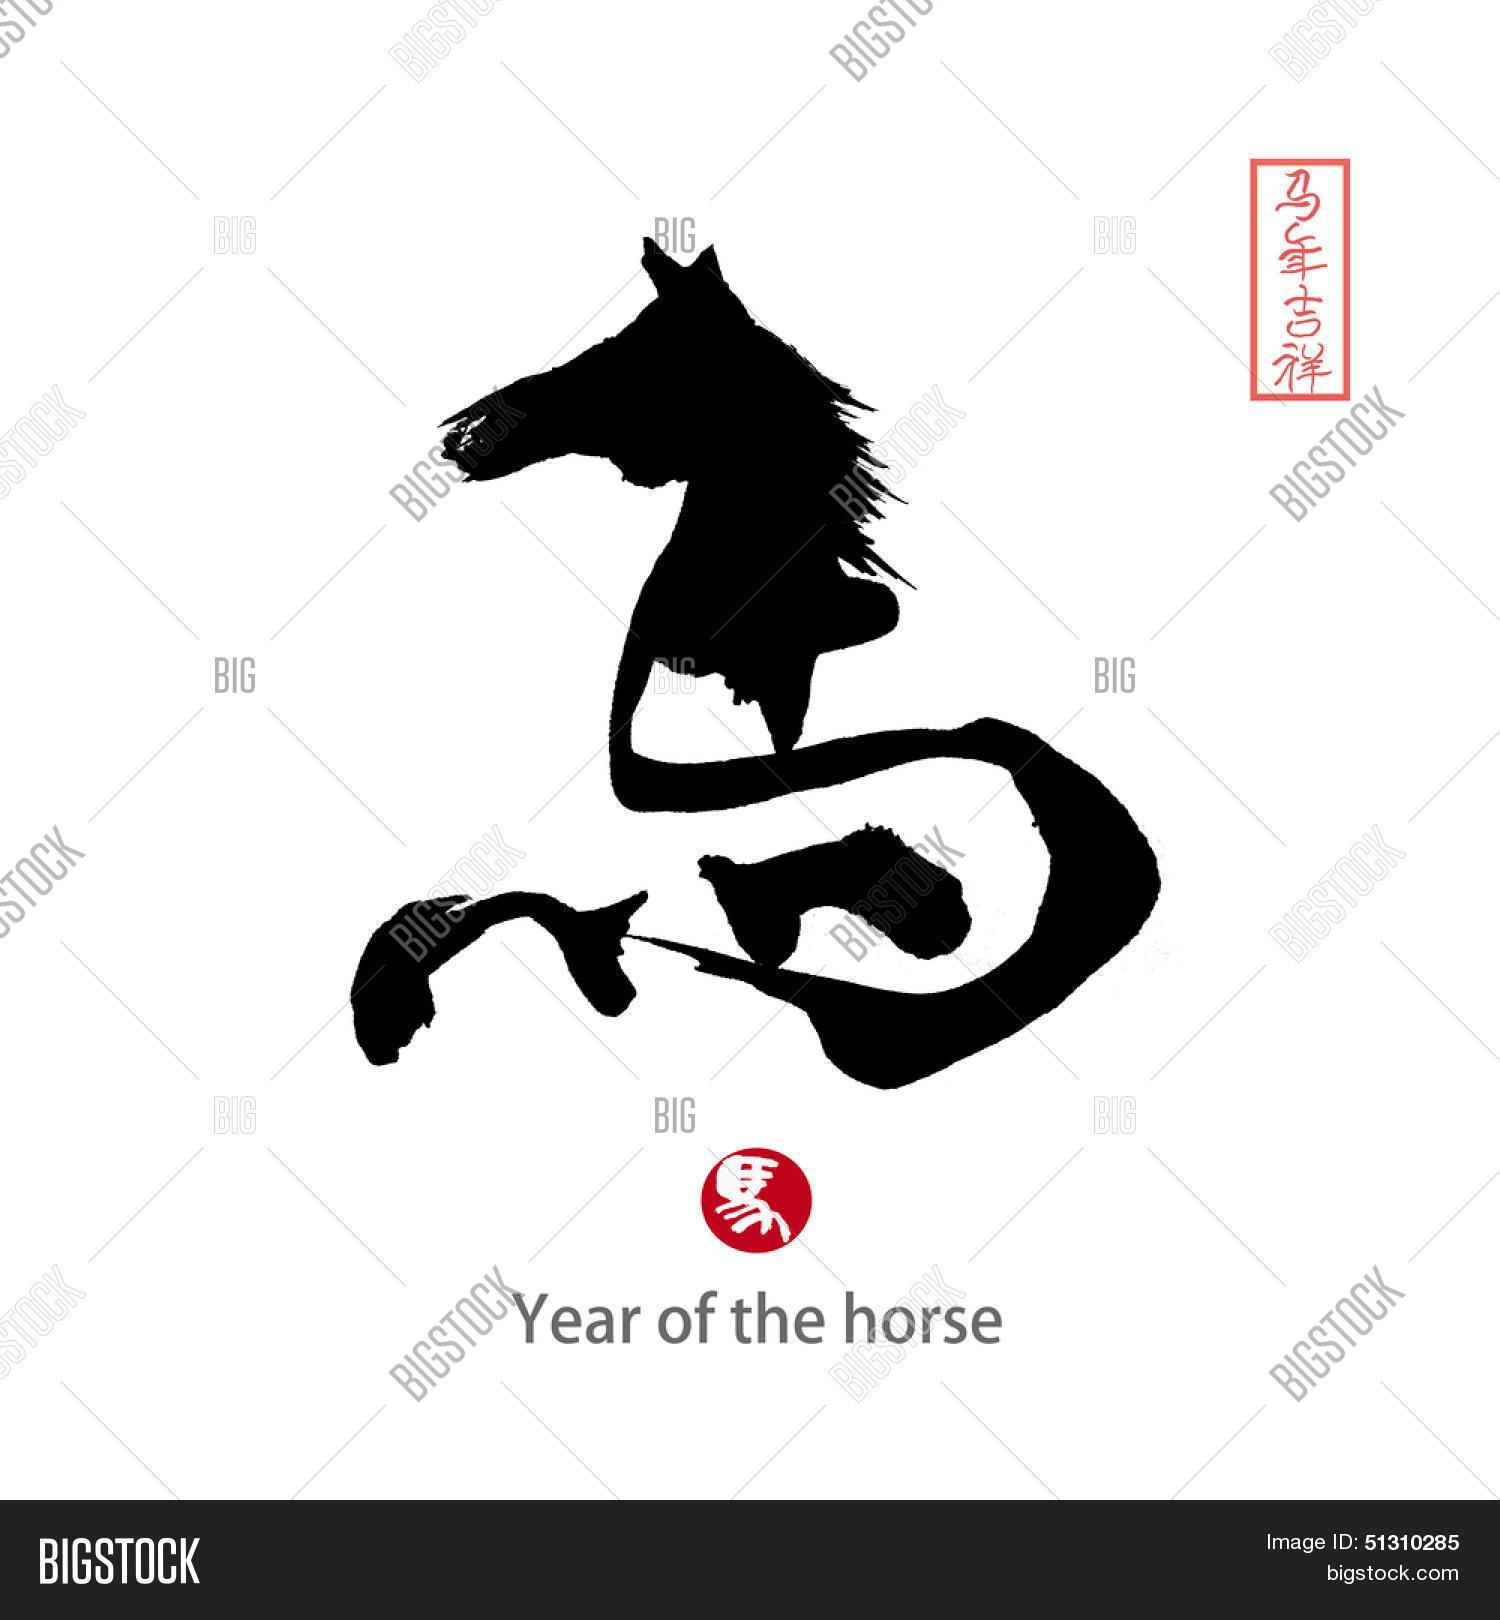 2014 year horsechinese calligraphy image photo bigstock 2014 is year of the horsechinese calligraphy word for horse biocorpaavc